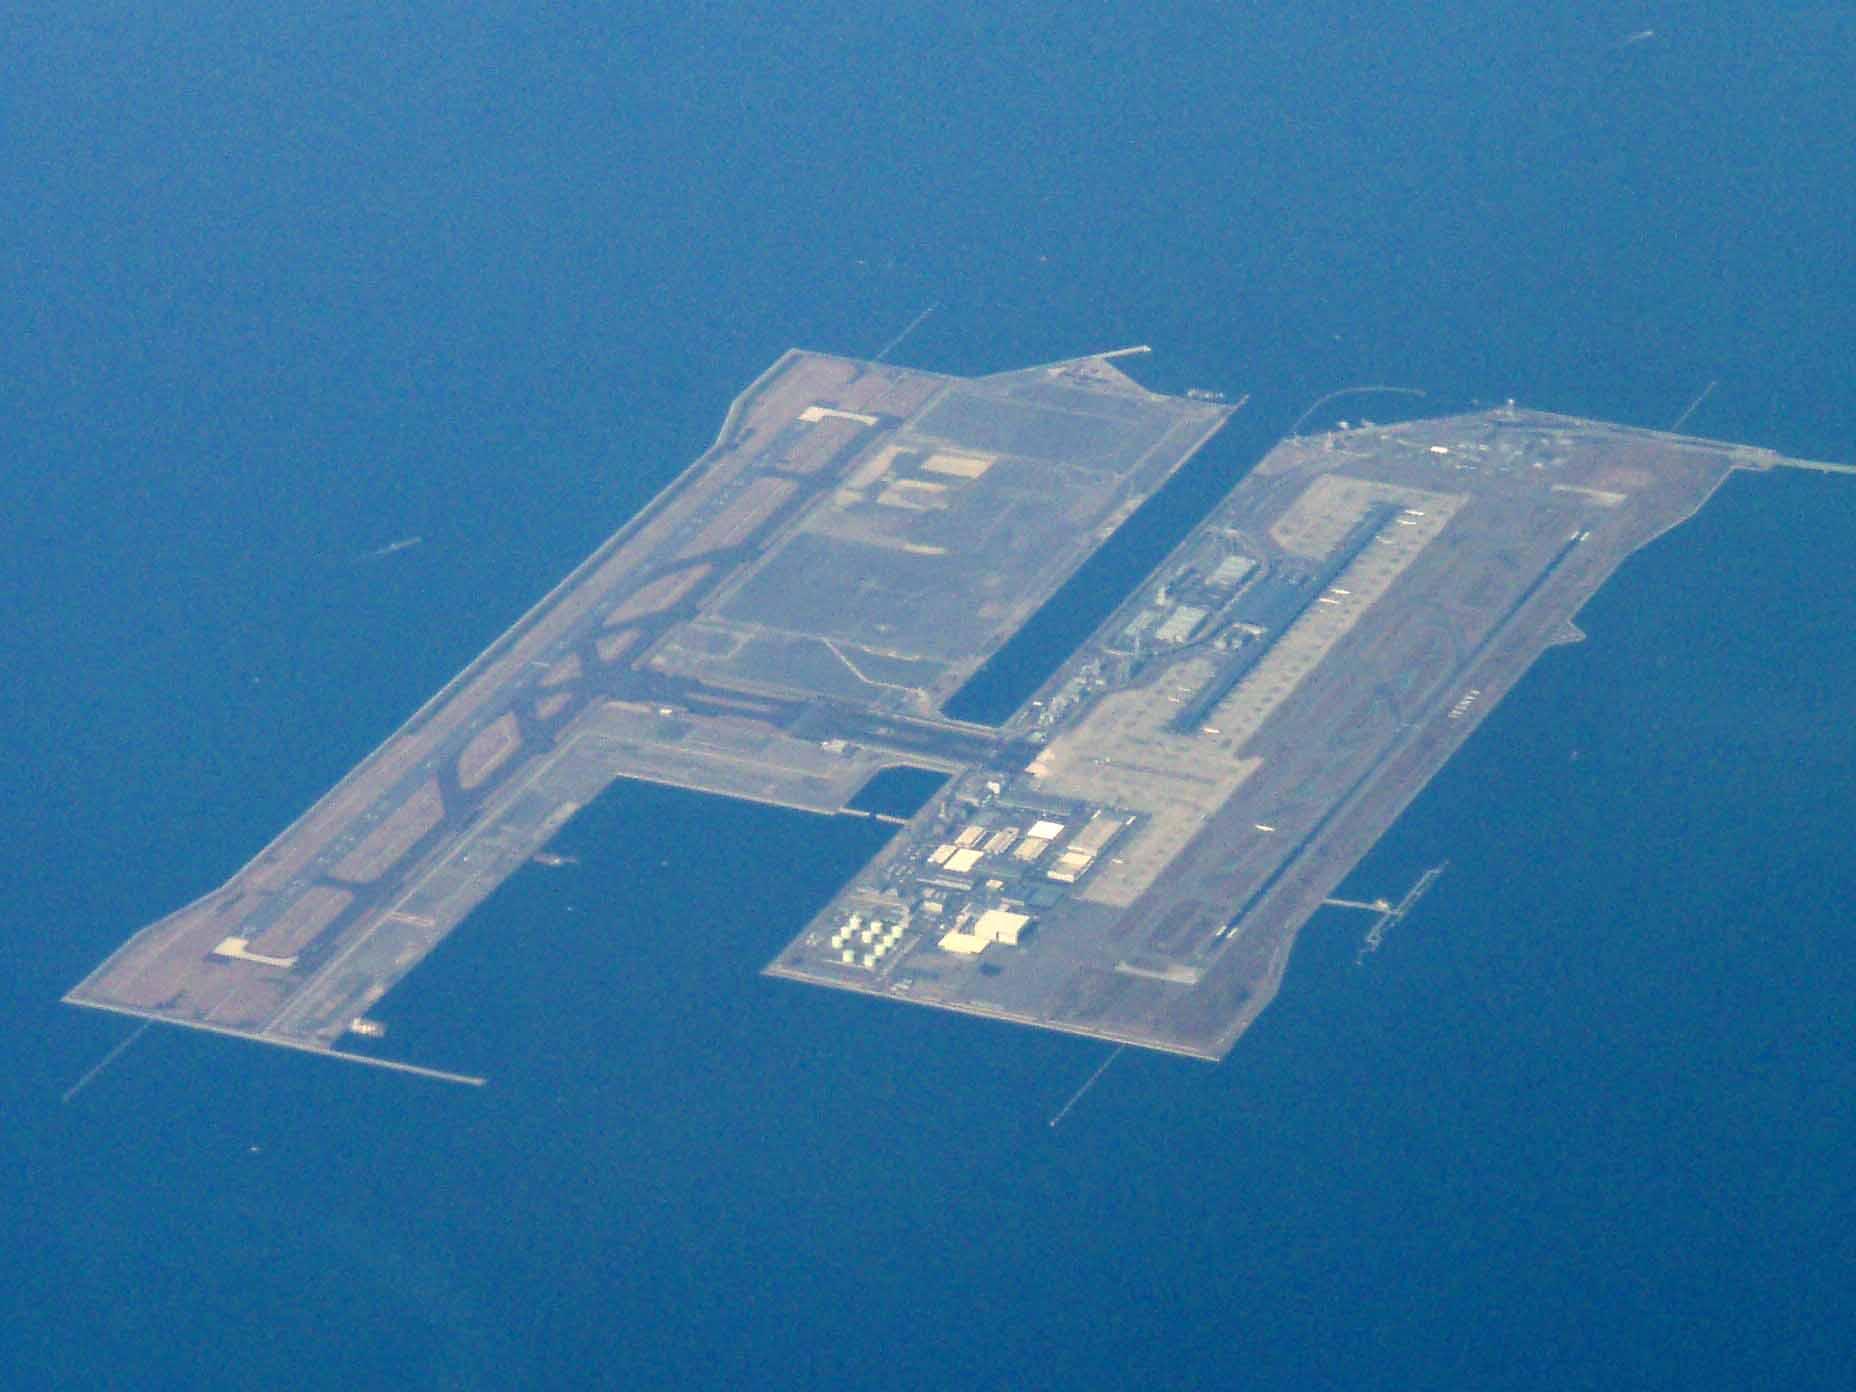 Aeroporto Tokyo : L aeroporto internazionale di narita tokyo foto royalty free